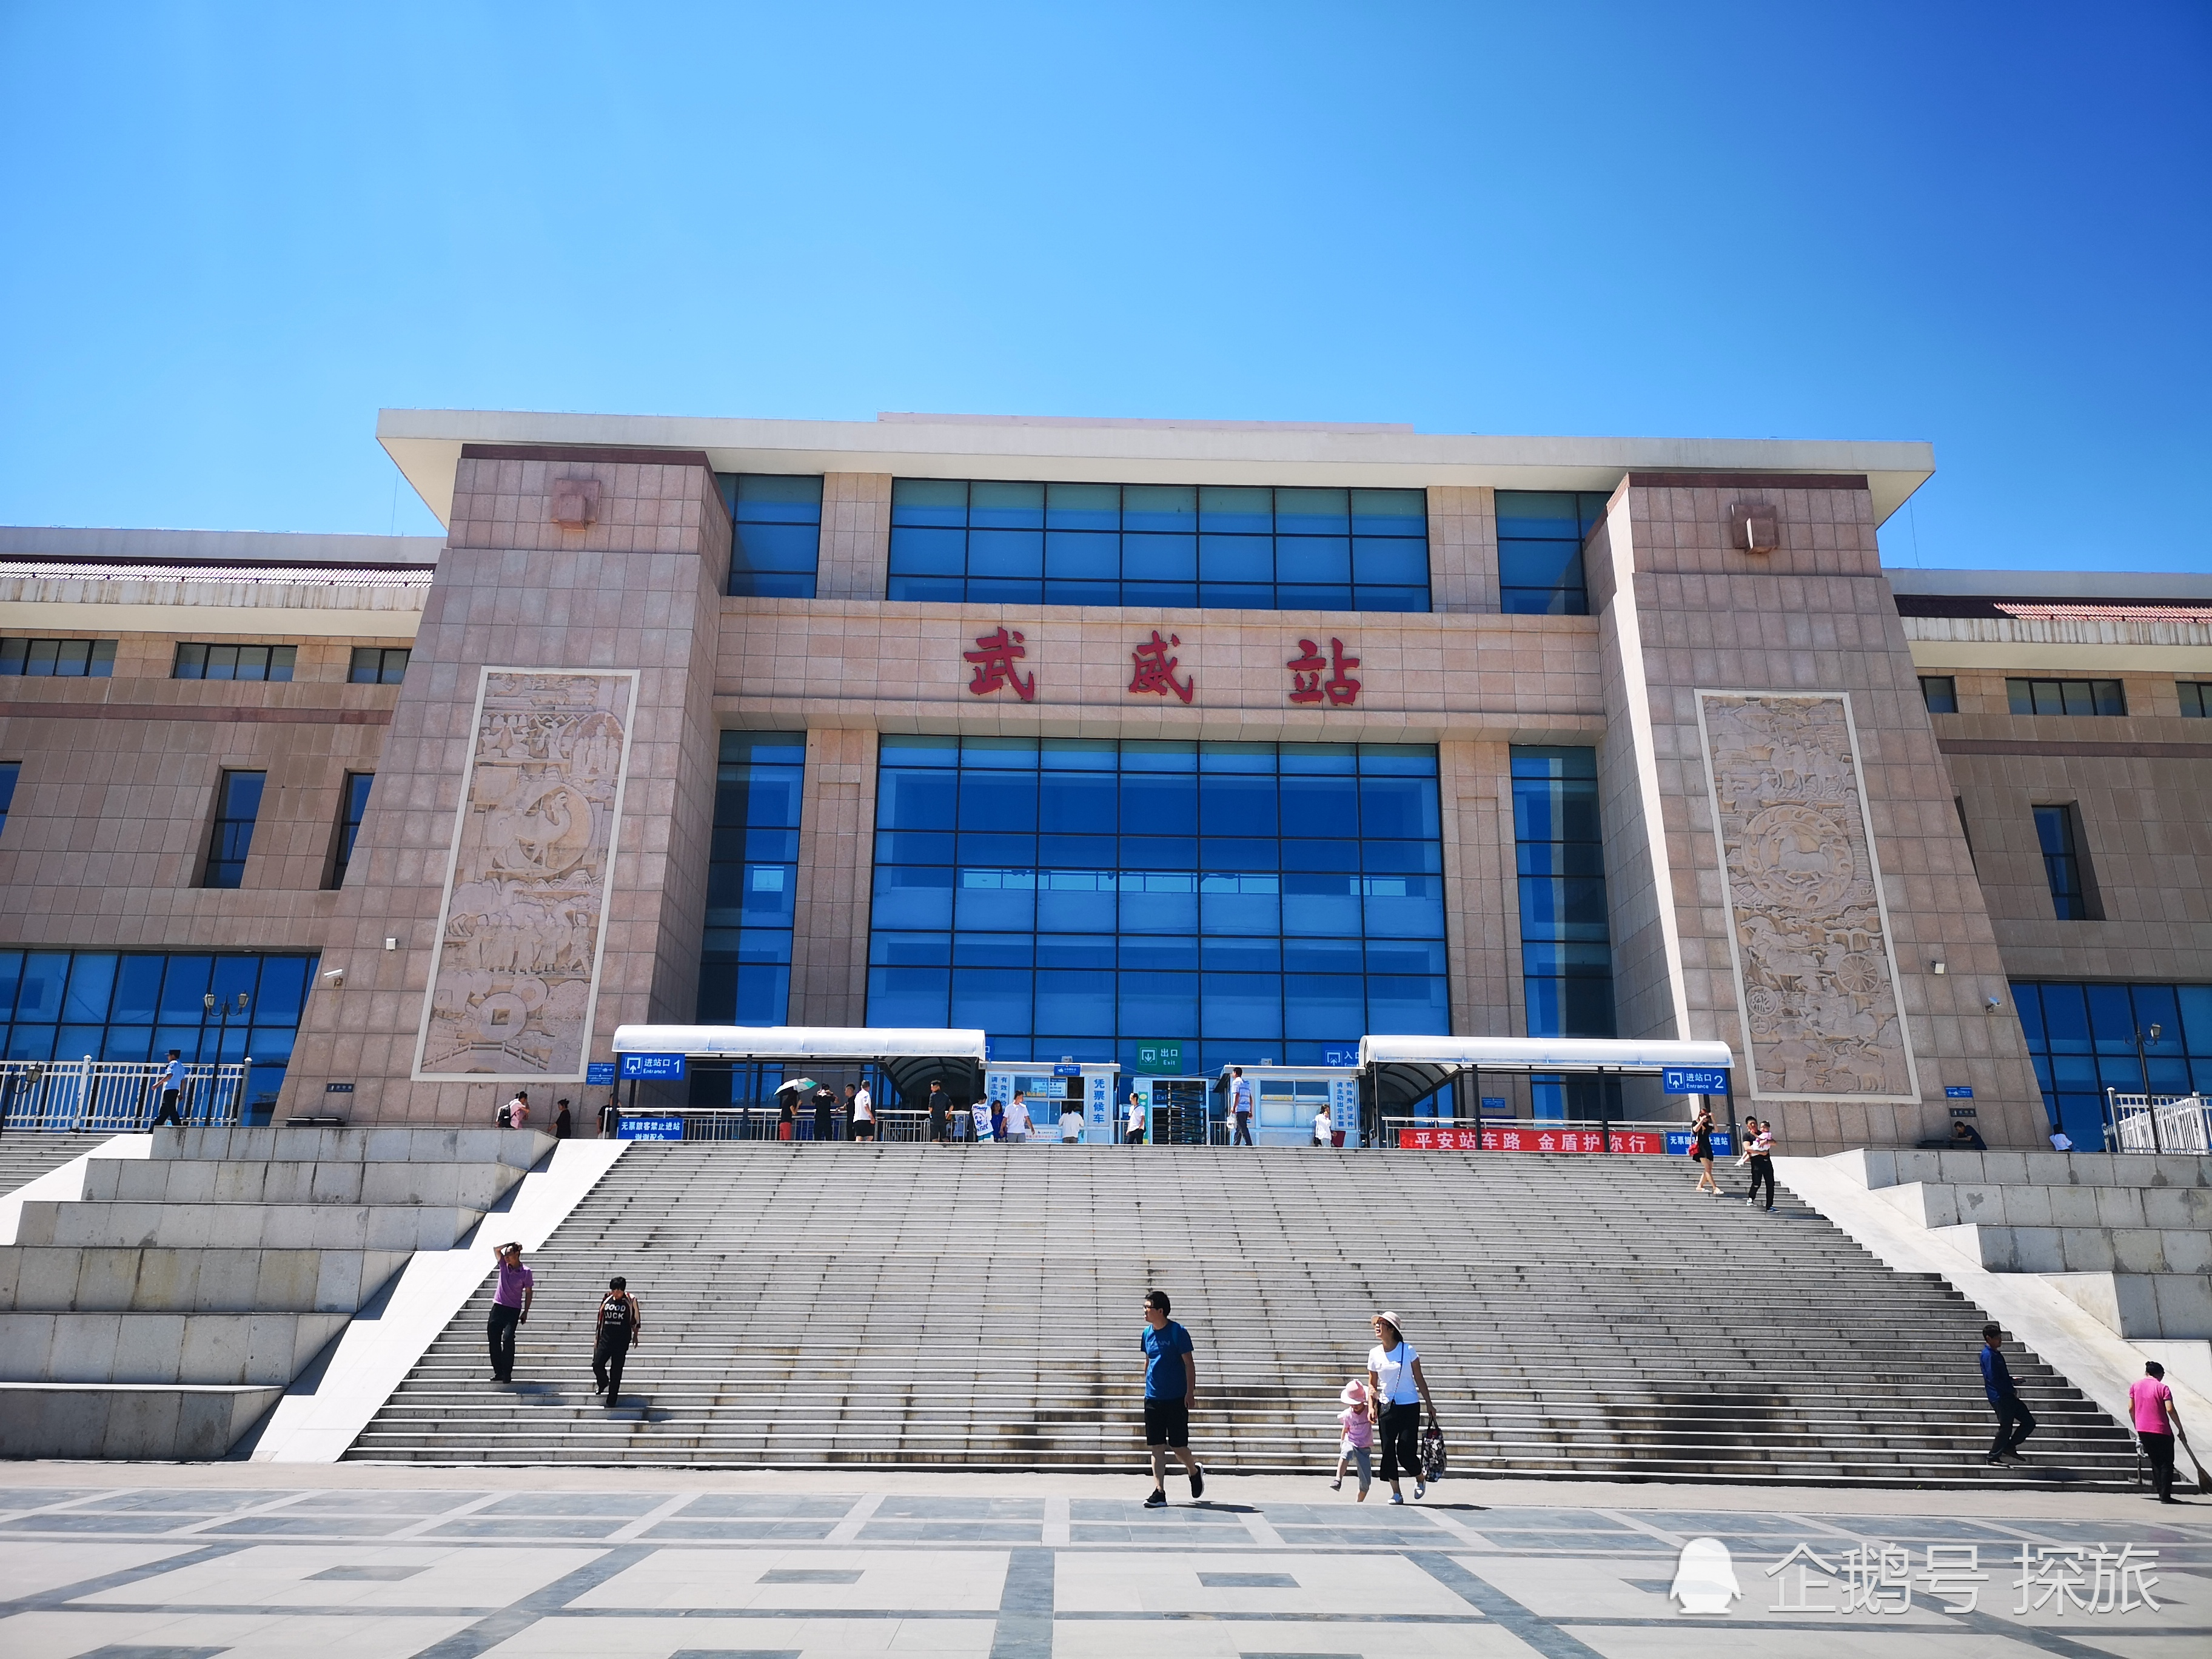 <b>甘肃武威城市风光,9张高清大图,请收好!</b>